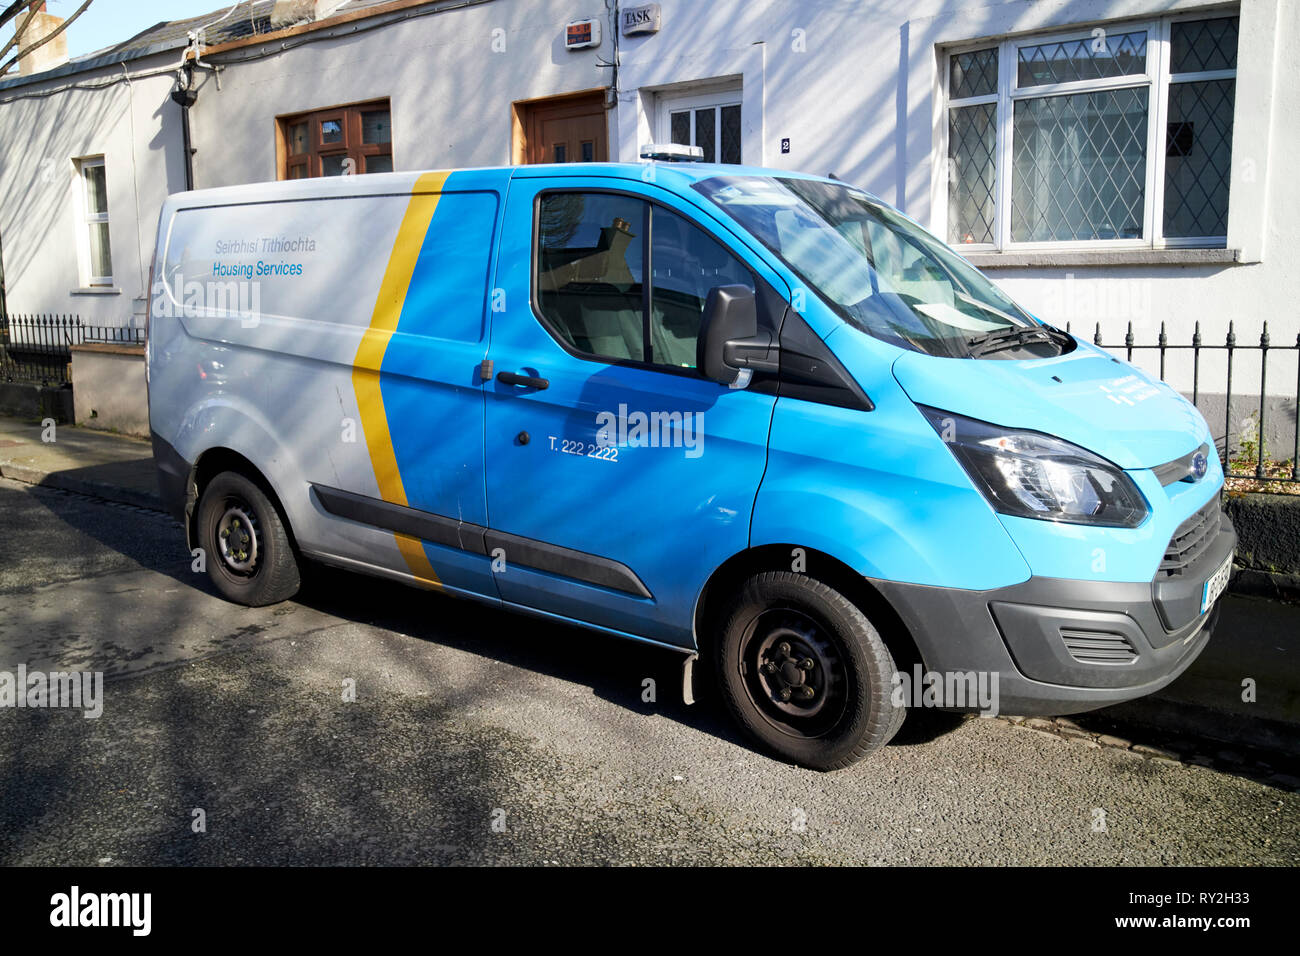 dublin city council housing services service vehicle Dublin Republic of Ireland Europe Stock Photo